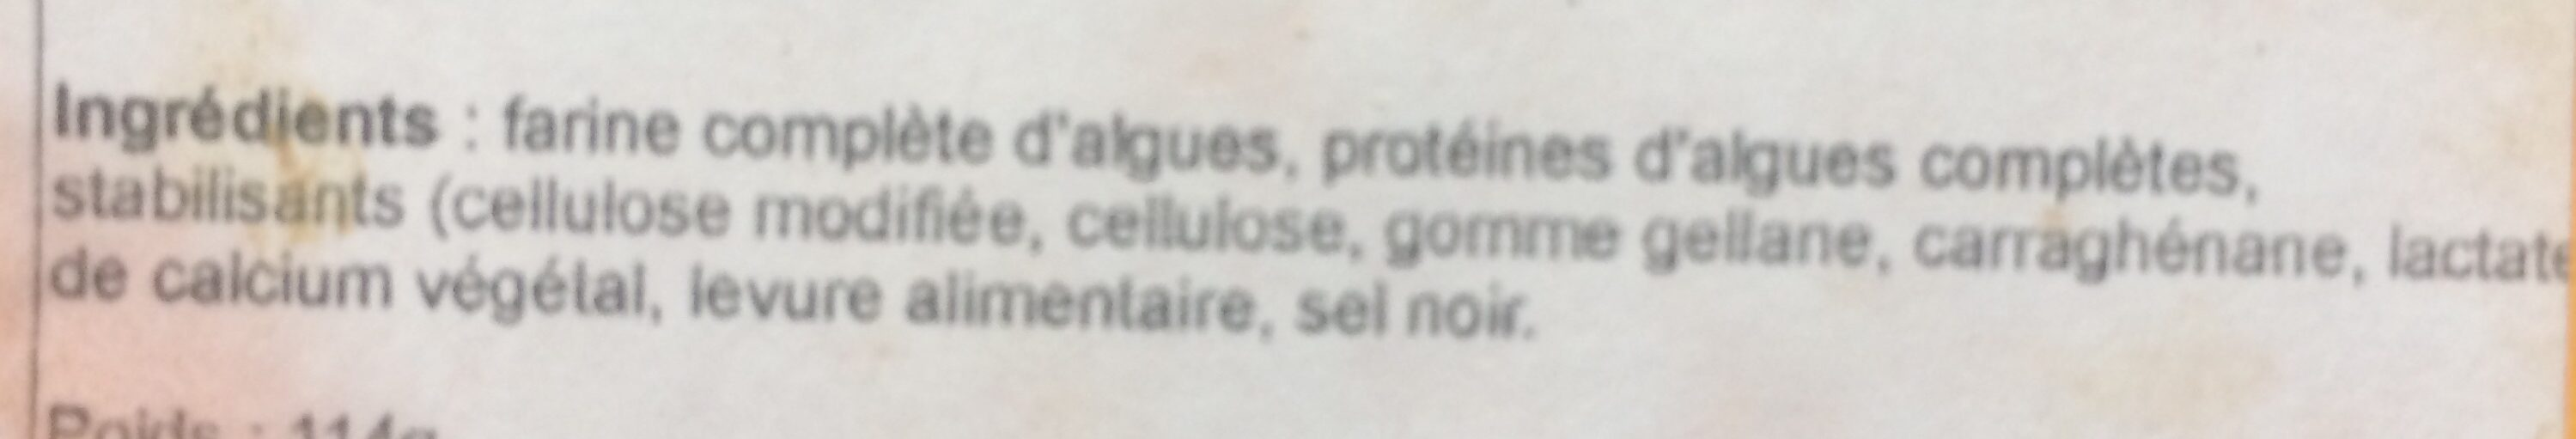 Veganegg - Ingrédients